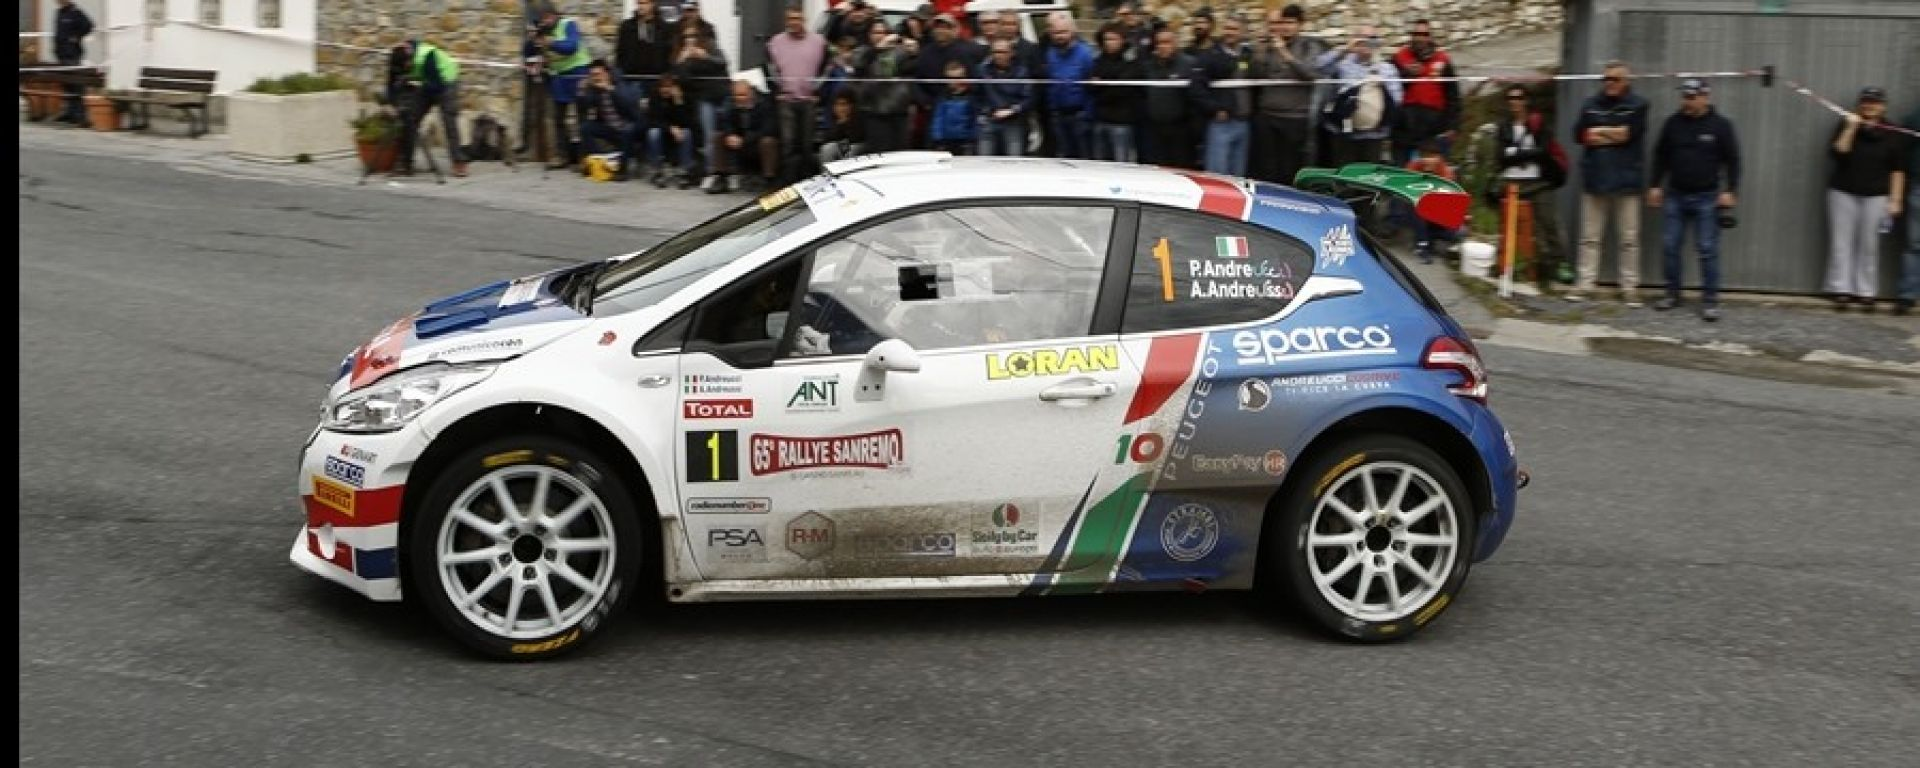 Rally Sanremo 2018: Andreucci trionfa insieme a Peugeot